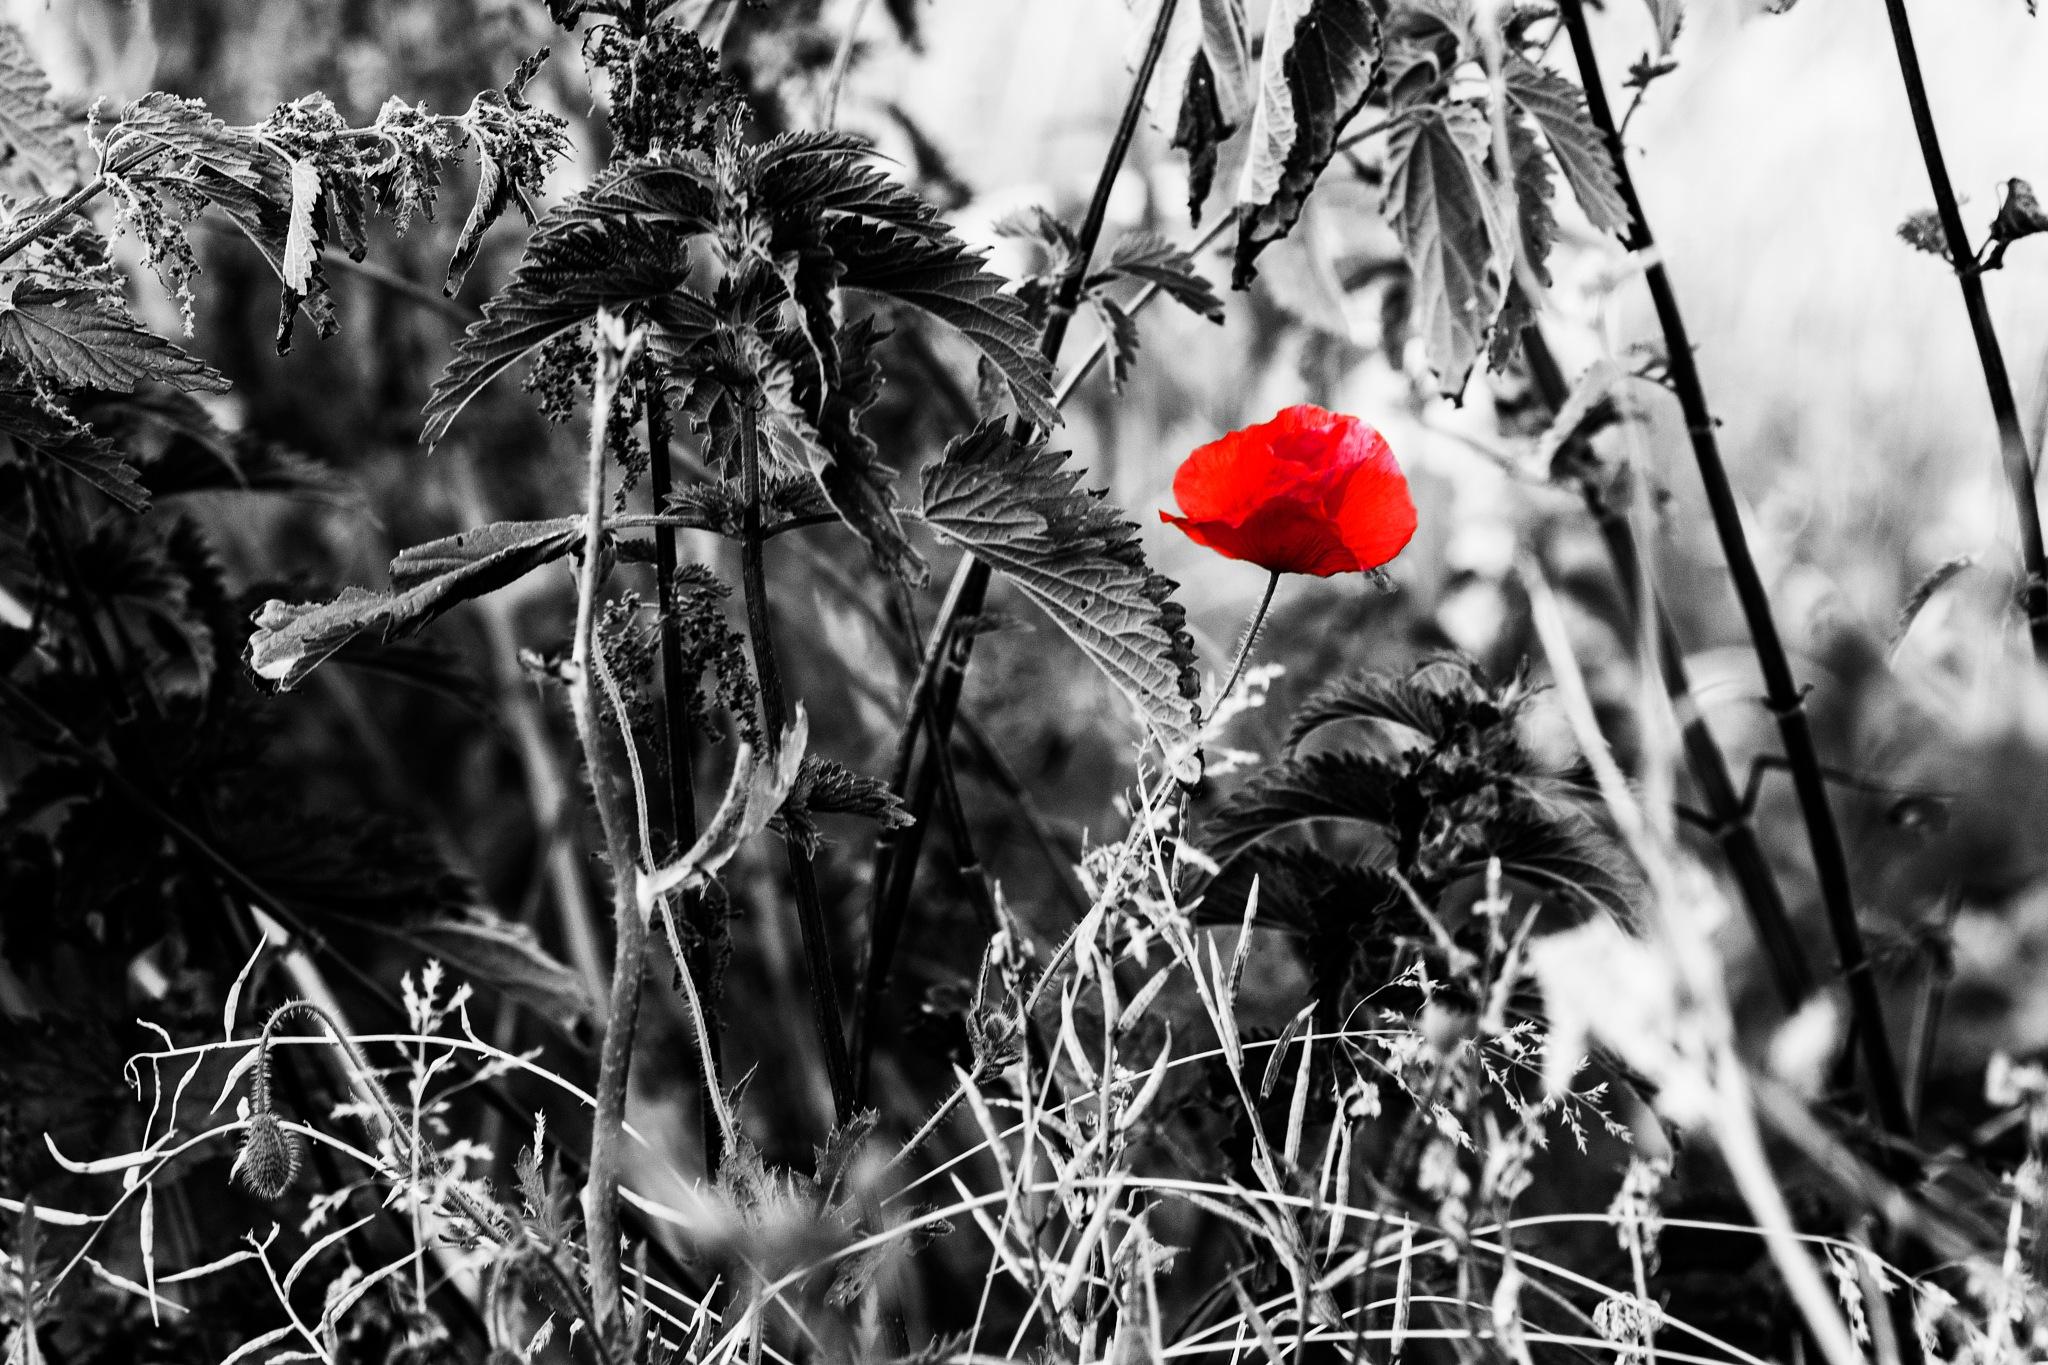 Poppy in our garden by Tom P